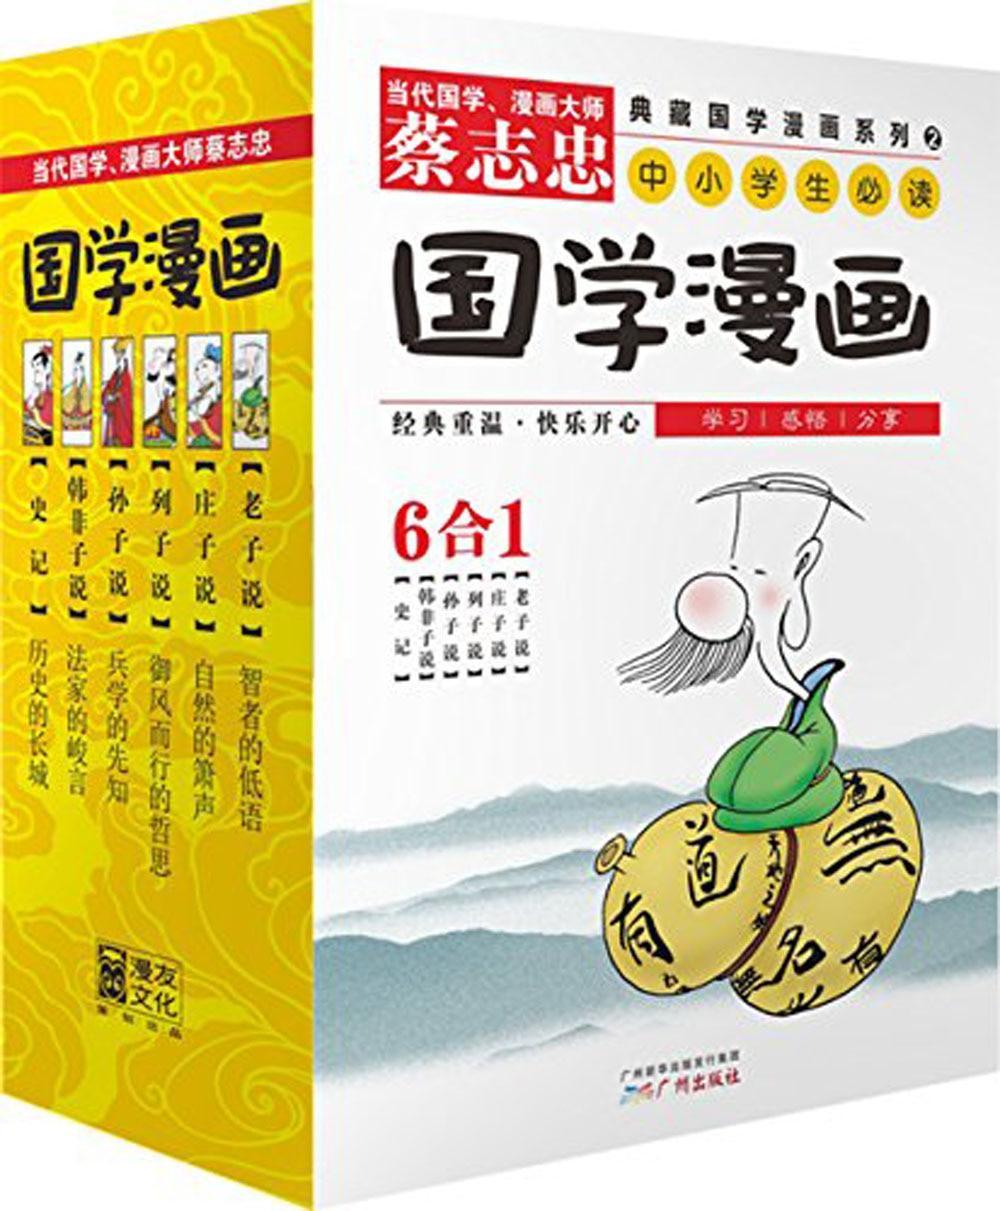 6pcs The Wisdom Of The Classics In Comics, Cai Zhizhong Historical Record Textbook